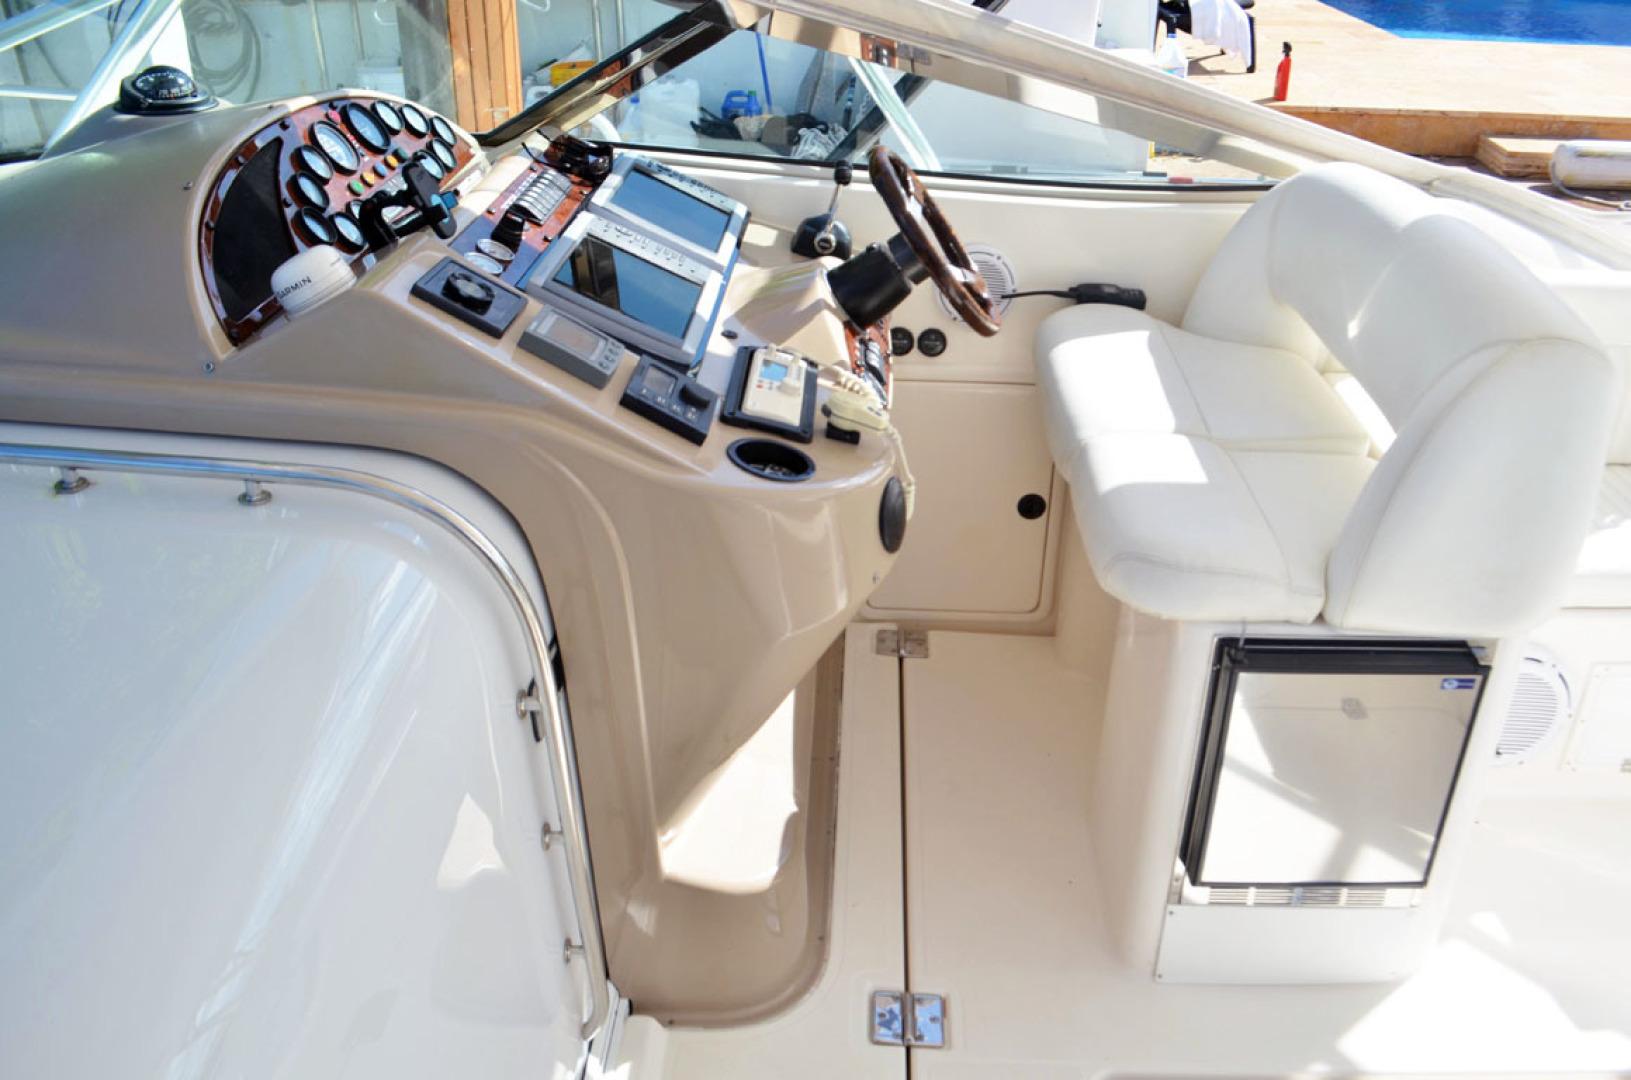 Riviera-4000 Express 2001-Shady Lady Hampton Bays-New York-United States-Helm Area-1547556 | Thumbnail